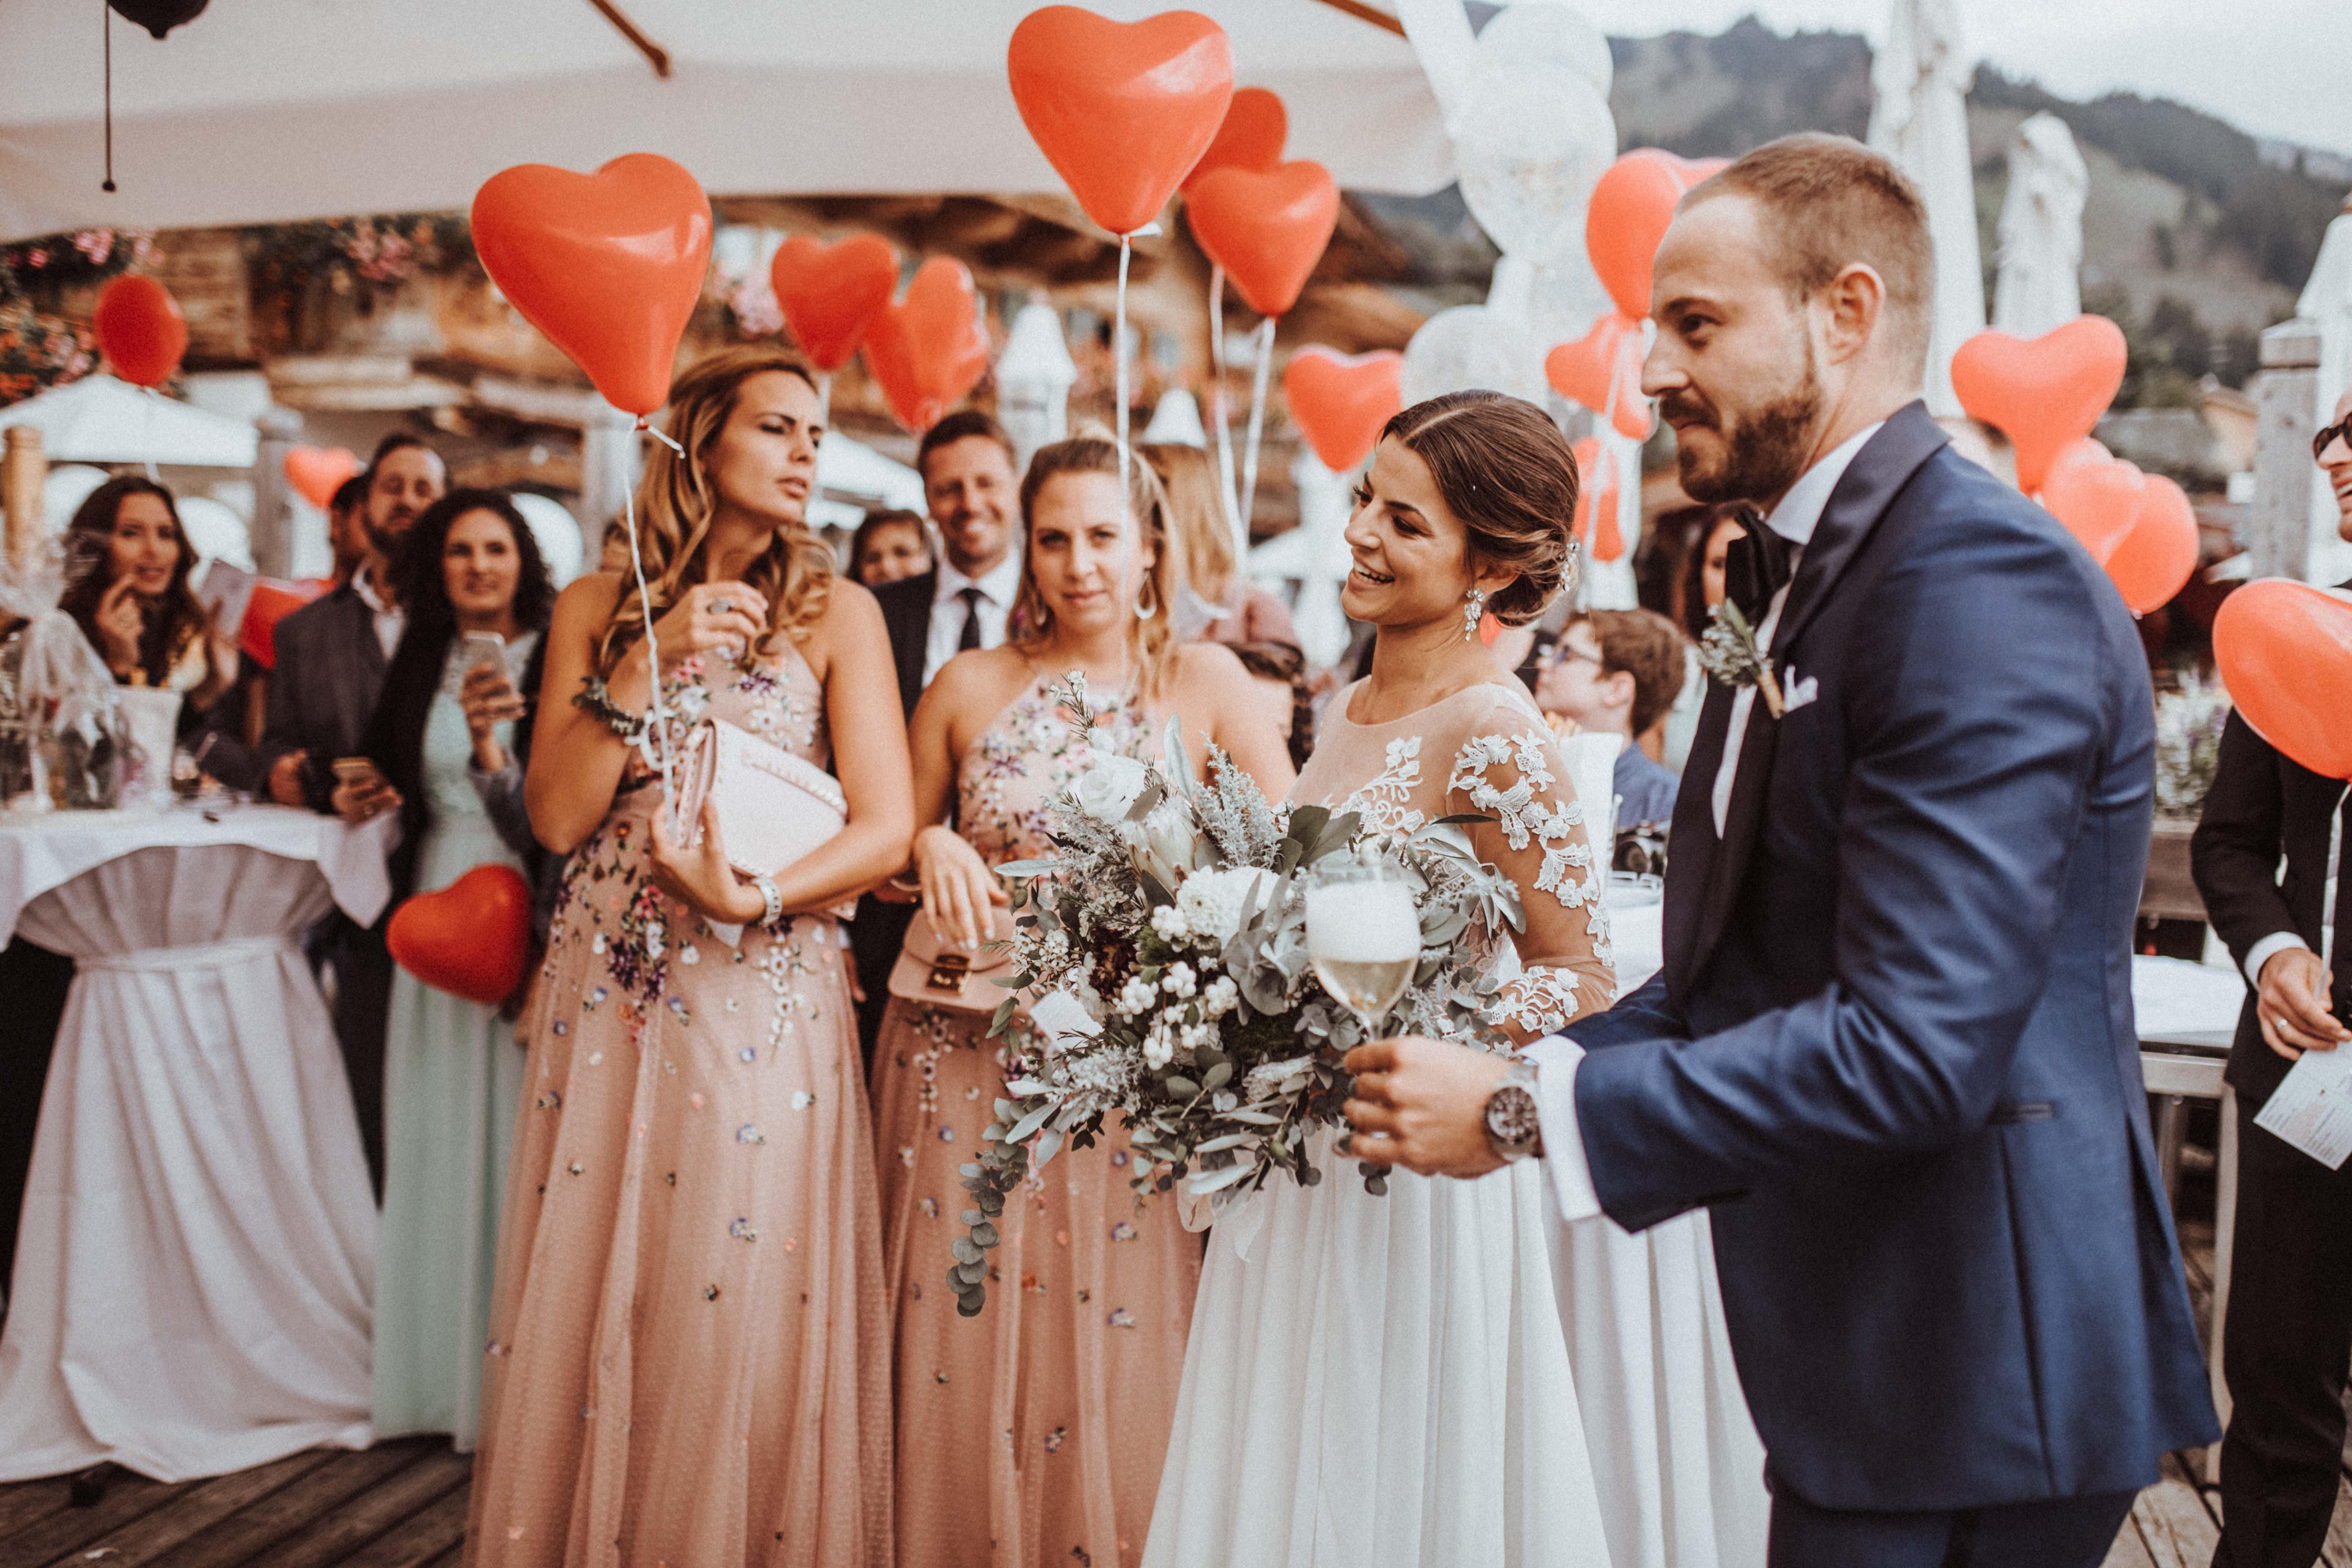 ansprache brautpaar Sonja Pöhlmann Photography Wedding München Bayern